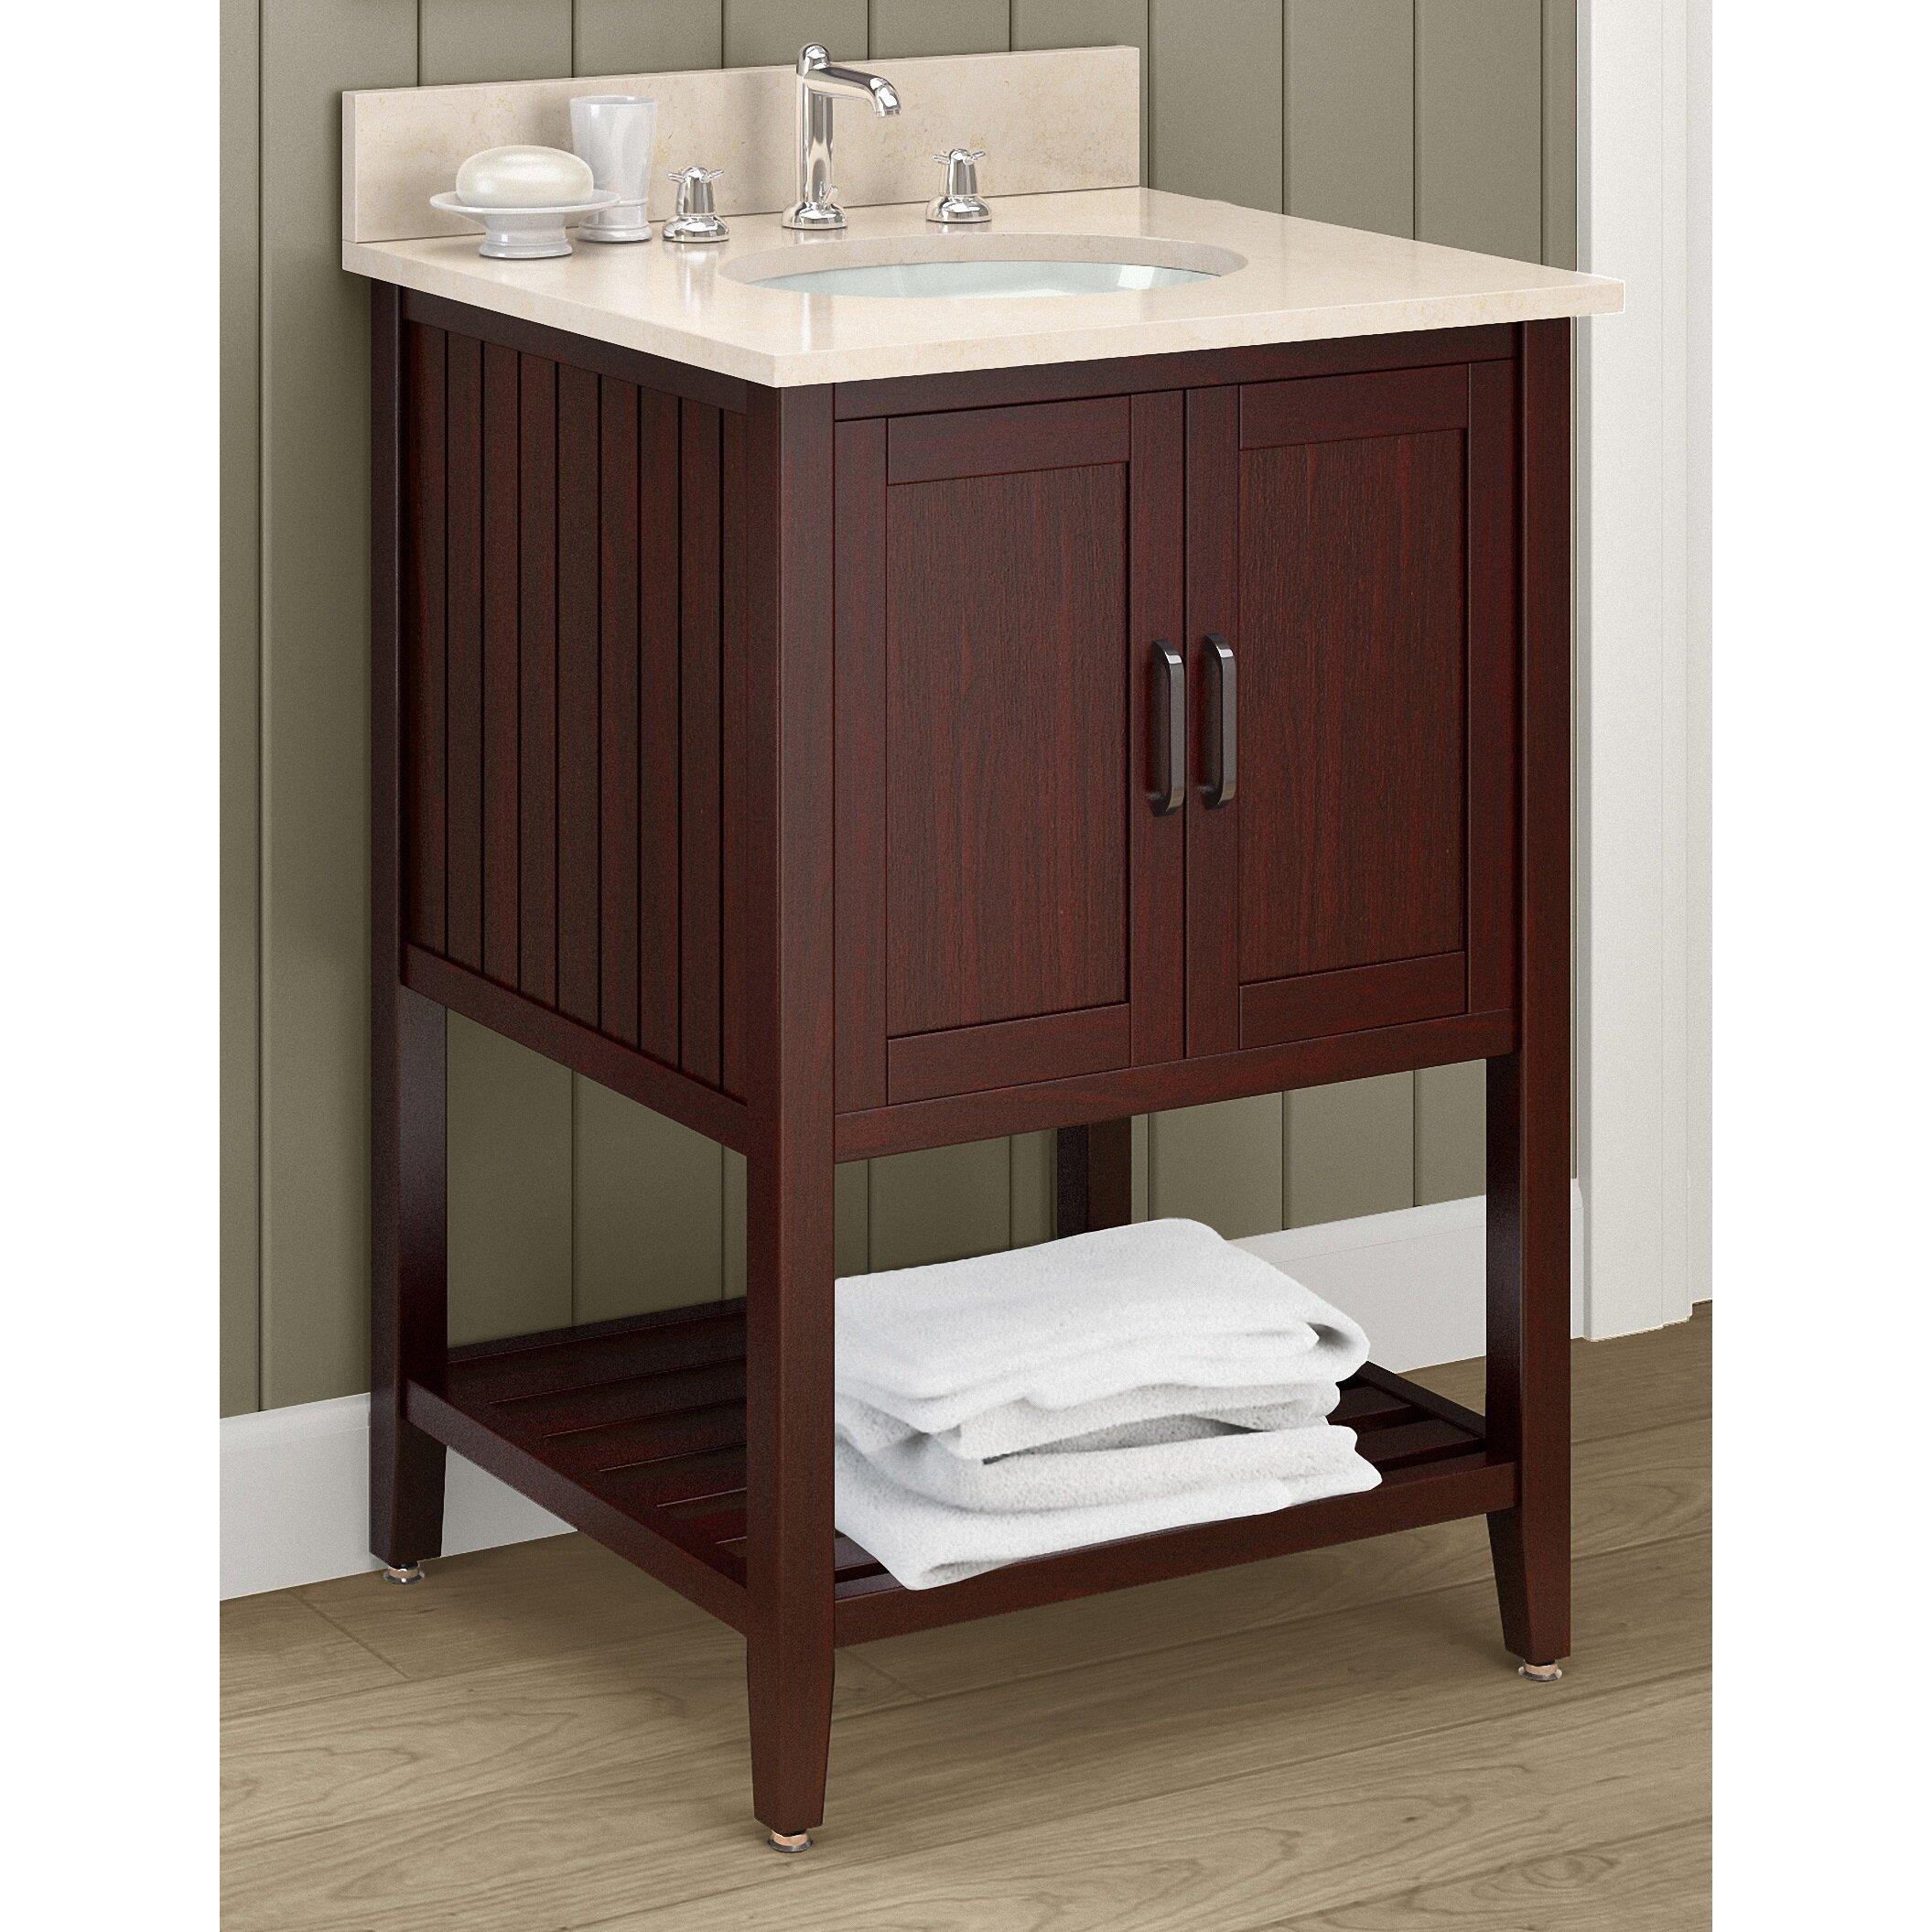 alaterre bennett 24 bath vanity wayfair. Black Bedroom Furniture Sets. Home Design Ideas